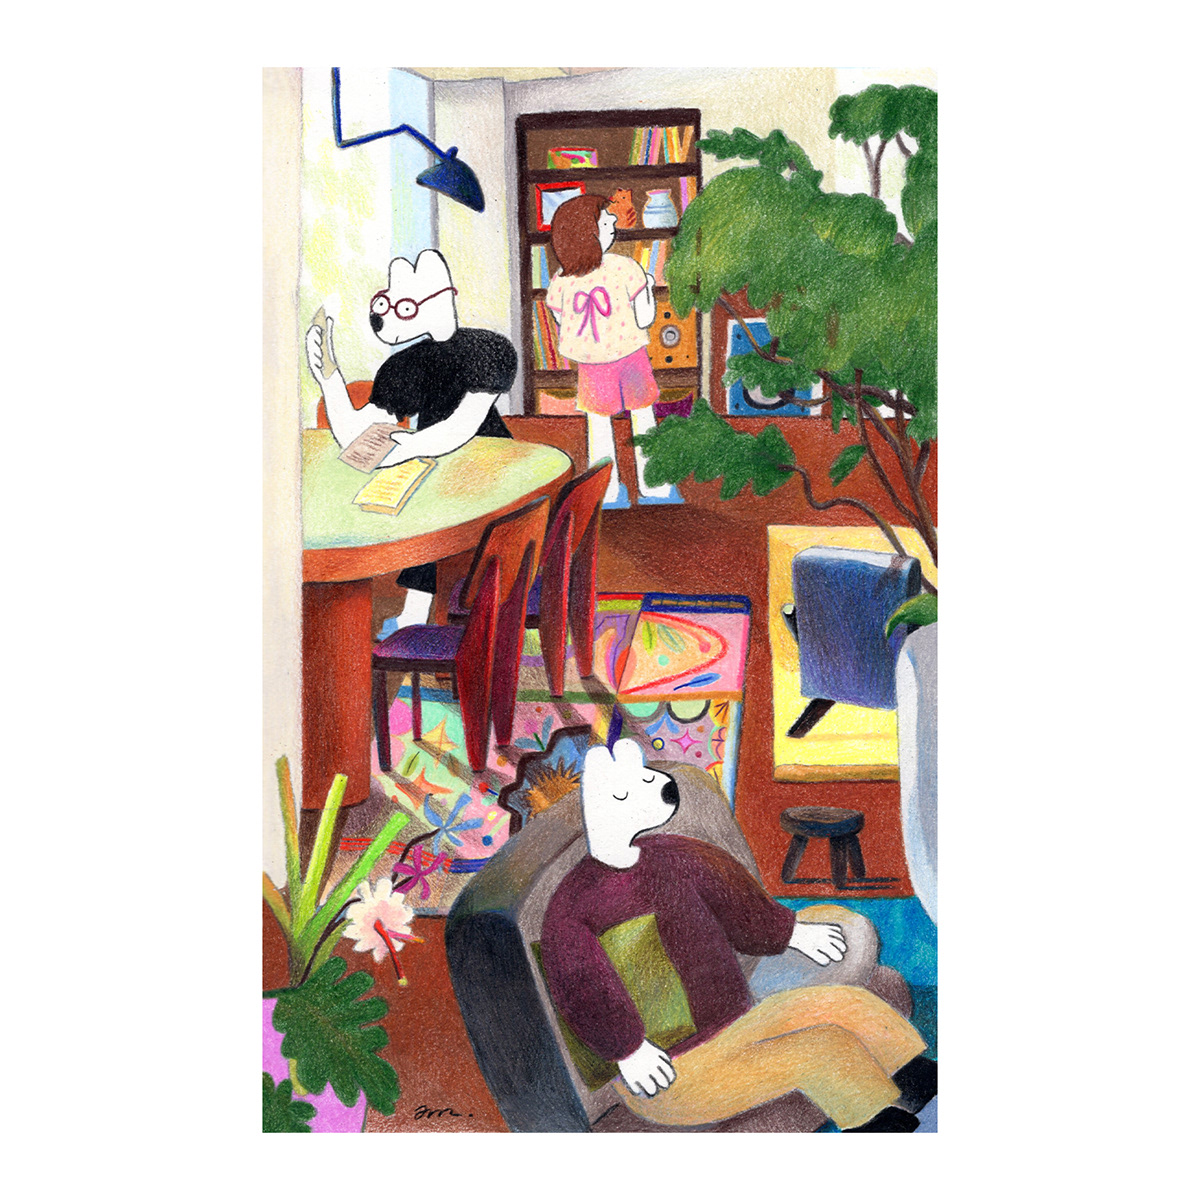 ColorPencil ILLUSTRATION  Interior picturebook 공간 그림책 색연필 인테리어 일러스트